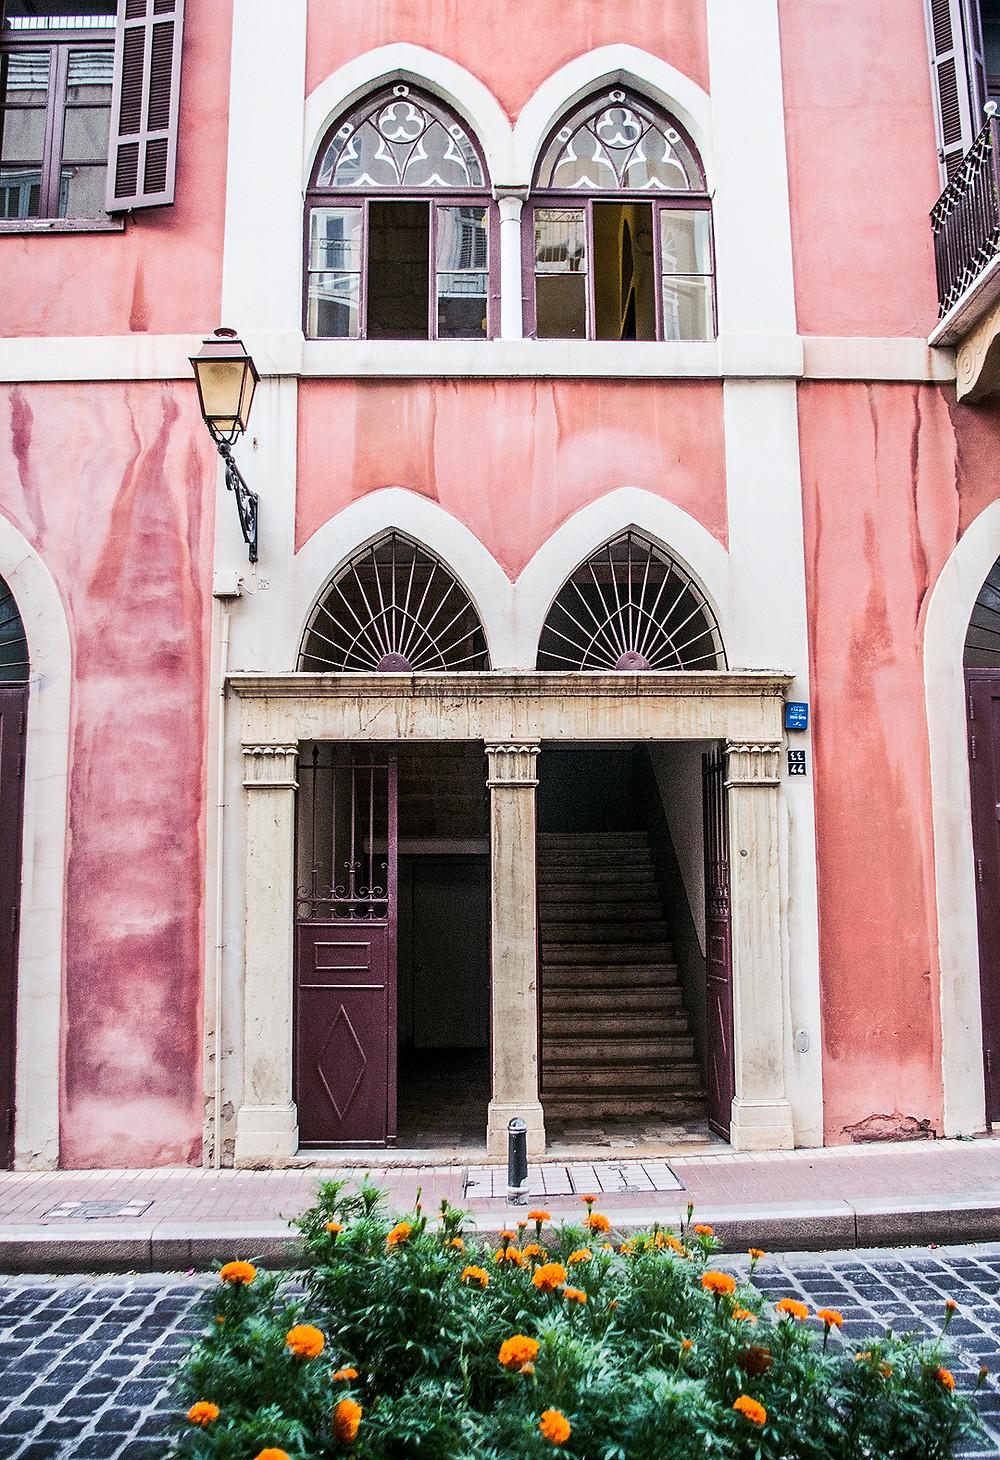 Pink building in Saifi Village, Beirut